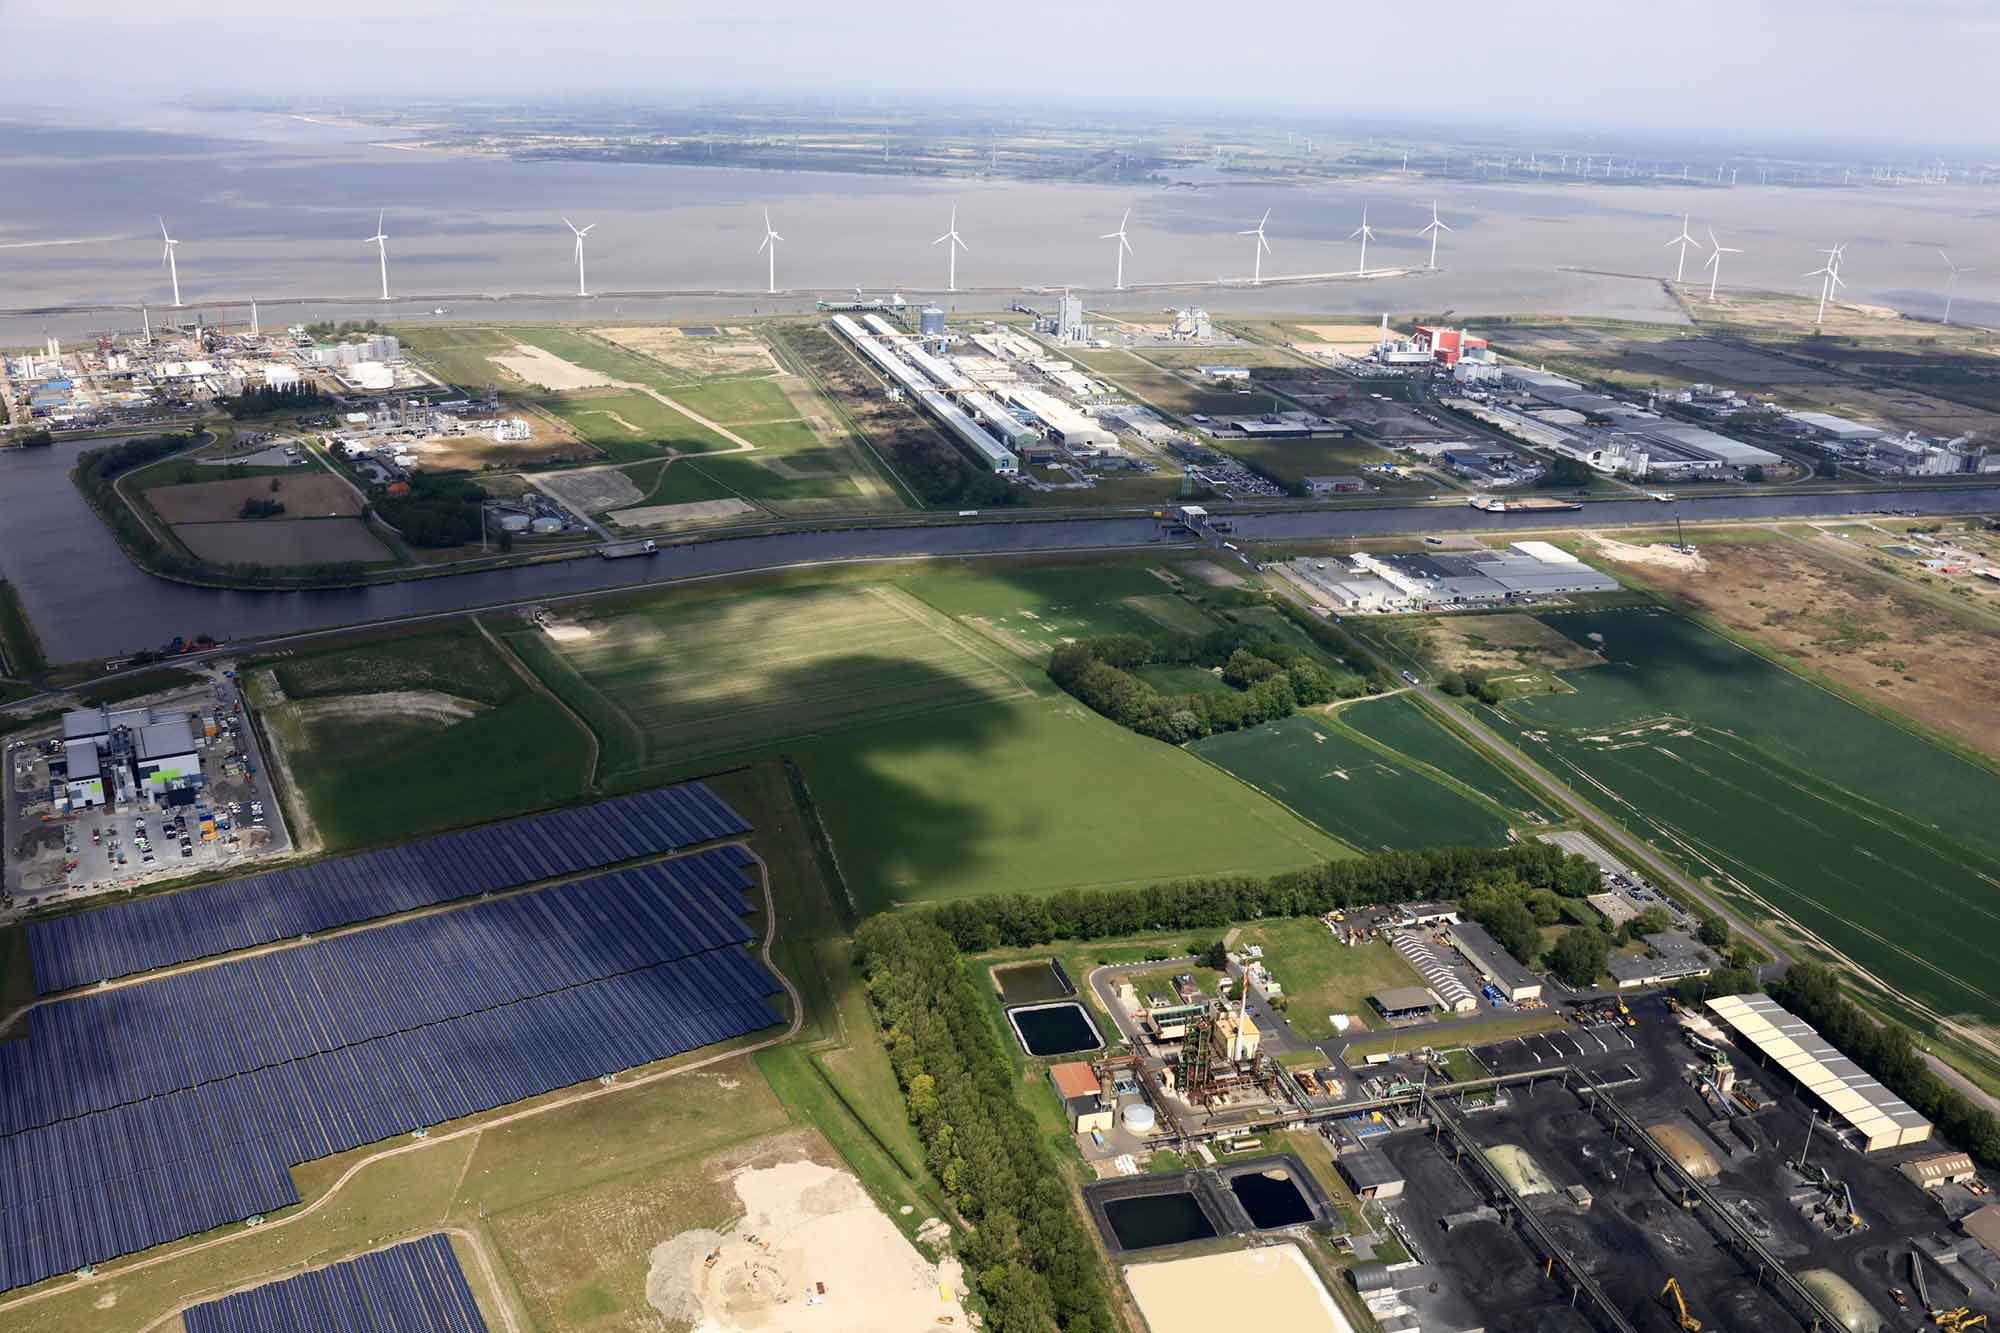 Industrial area Delfzijl